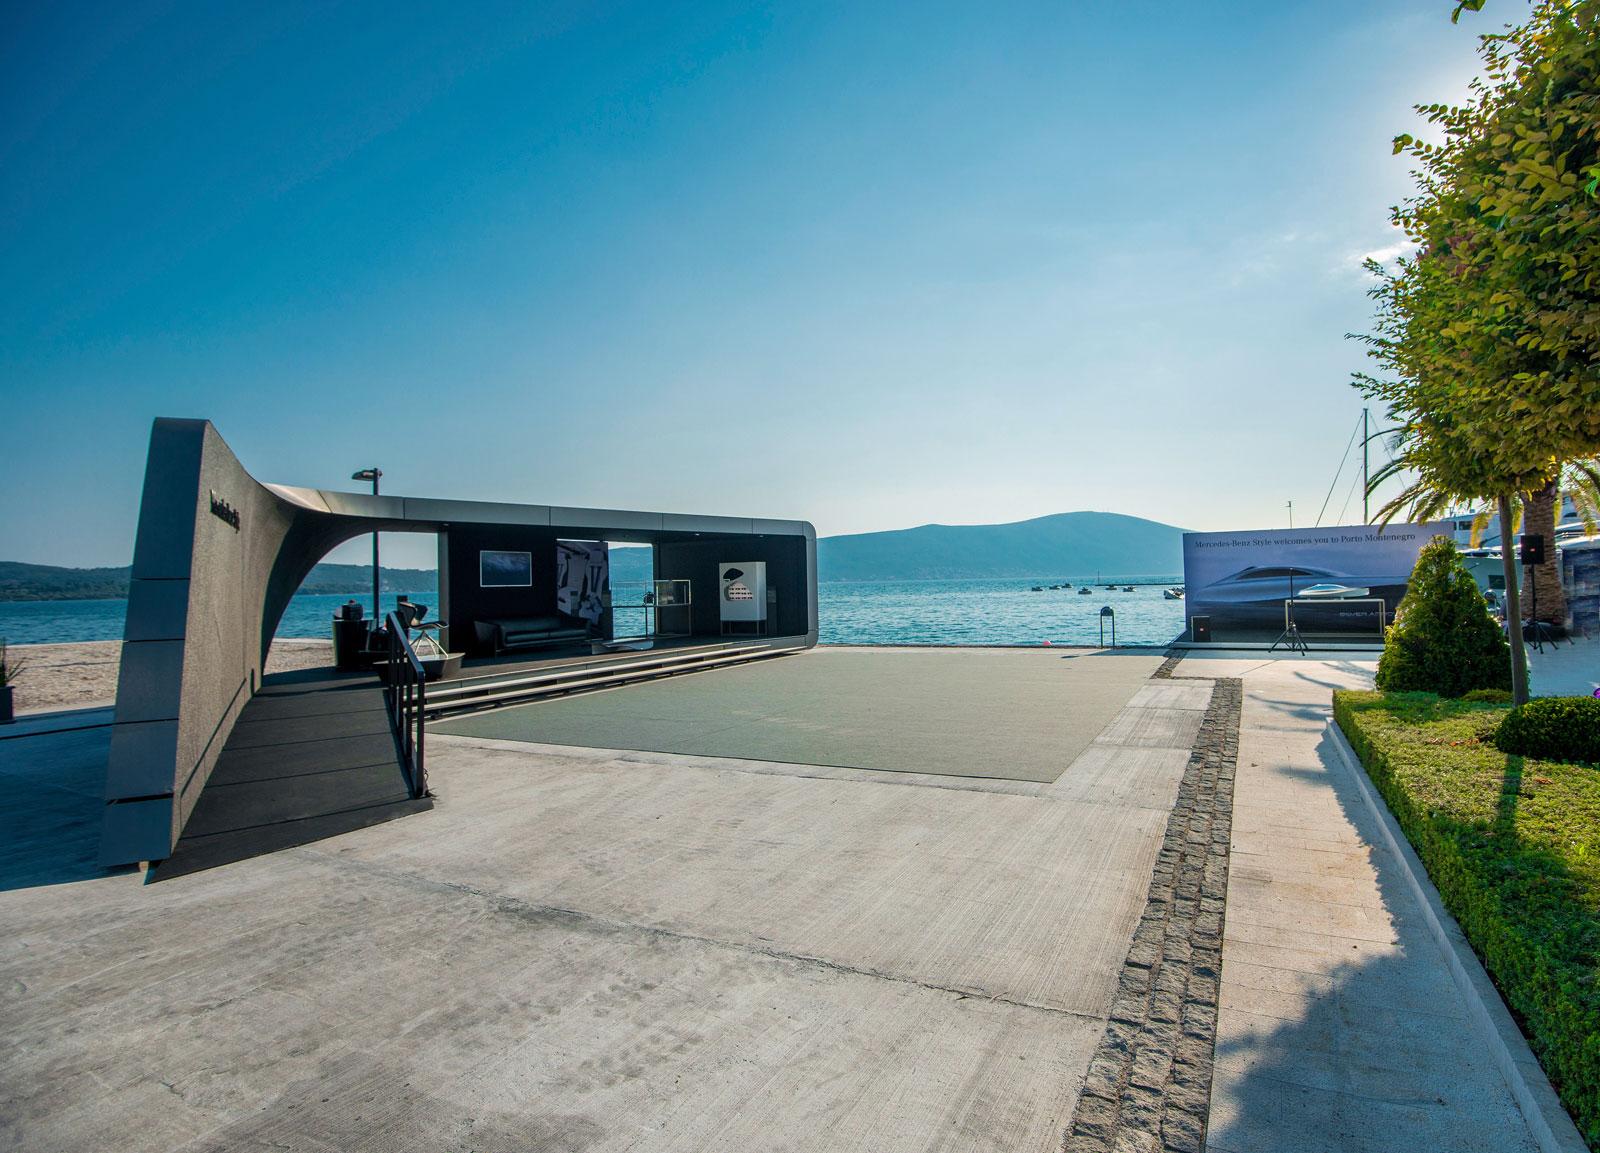 Mercedes Benz Style design pavilion in Porto Montenegro. Mercedes Benz Style design pavilion in Porto Montenegro   Car Body